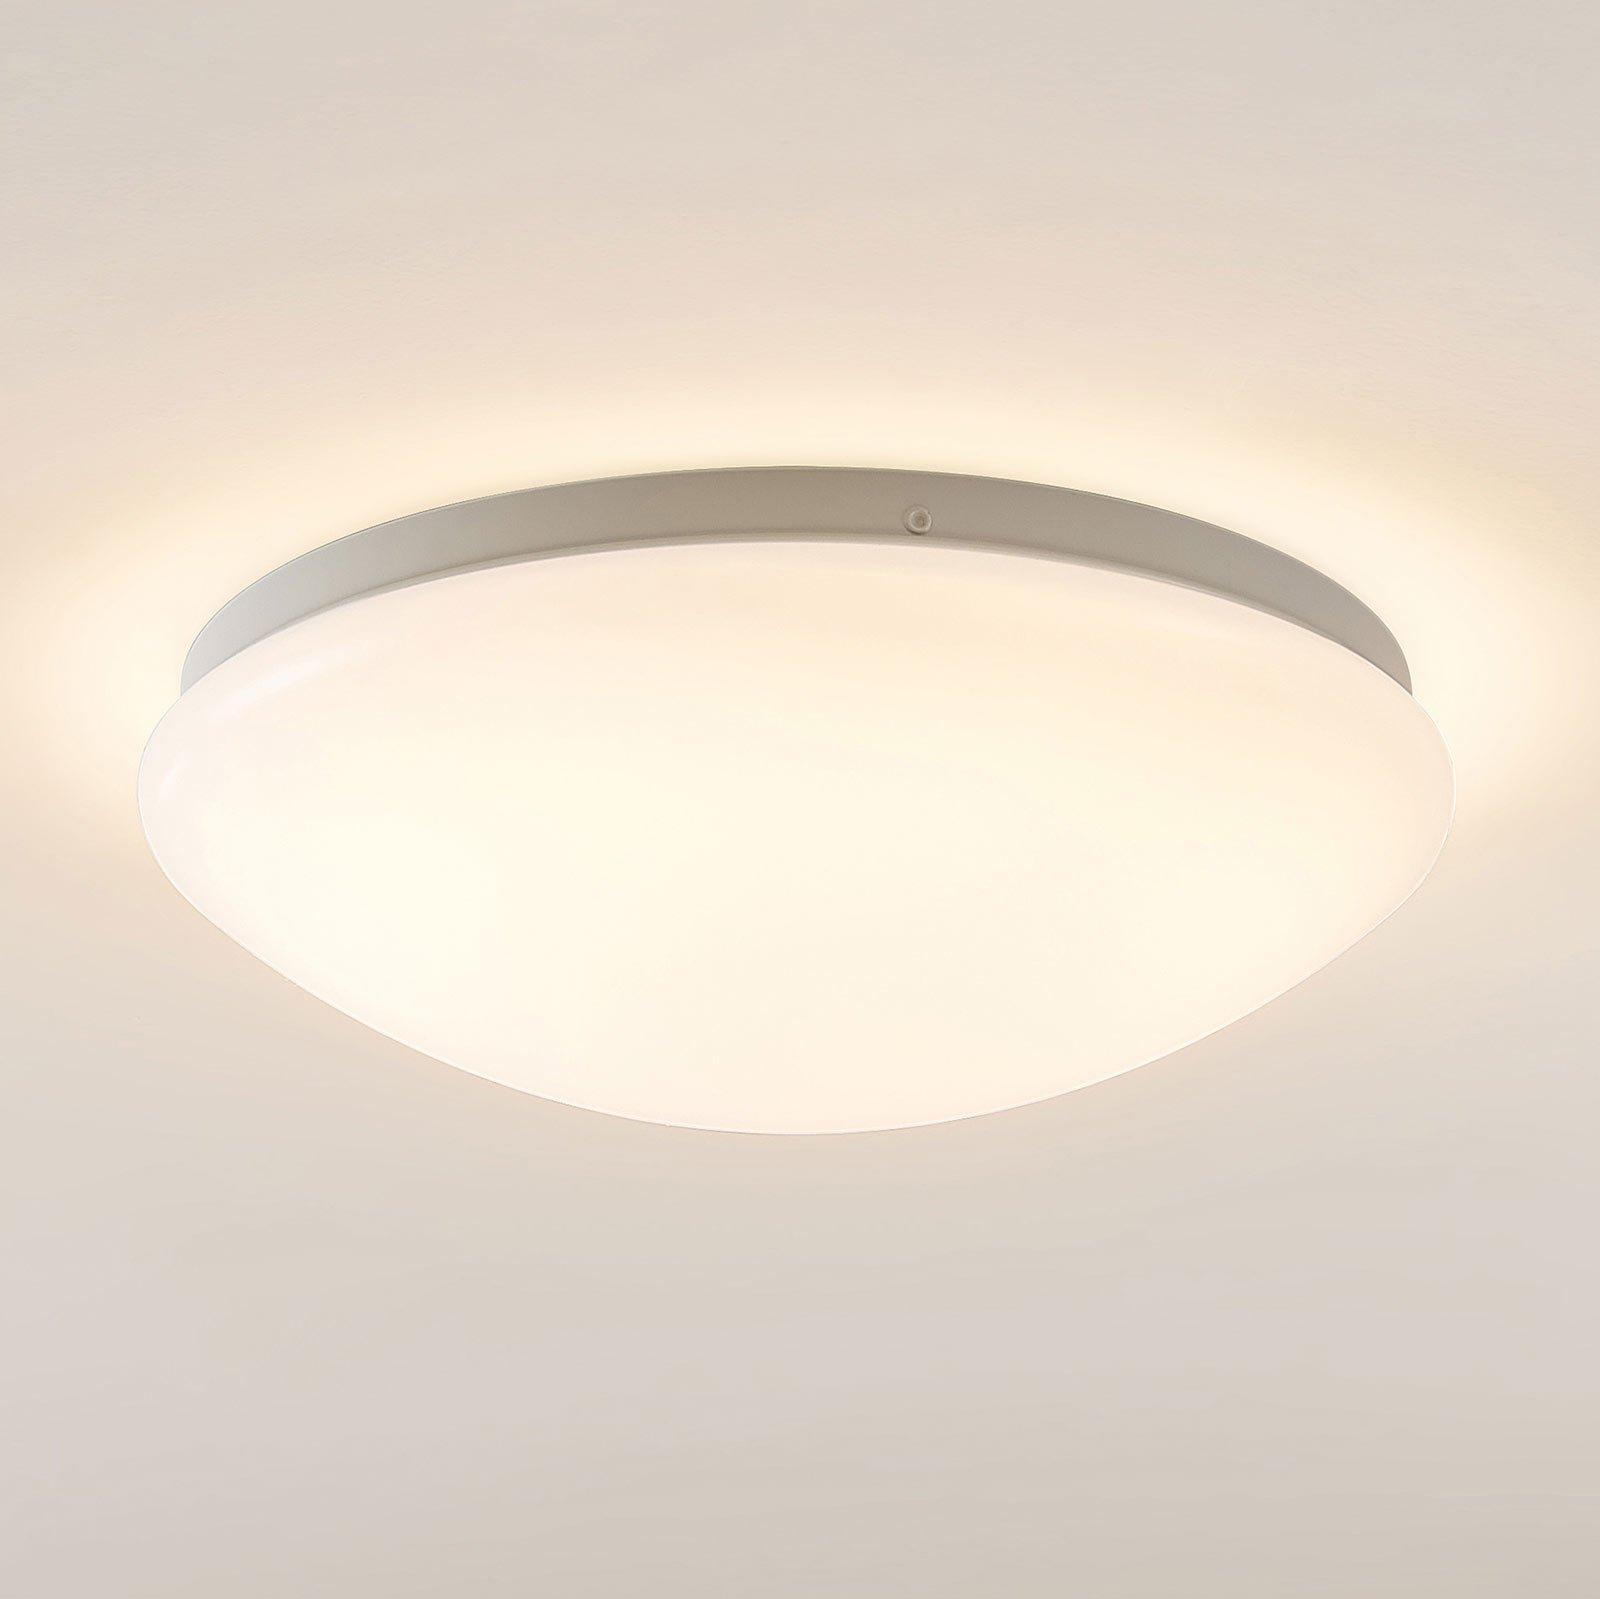 Arcchio Younes LED-taklampe, hvit, rund, 30 cm